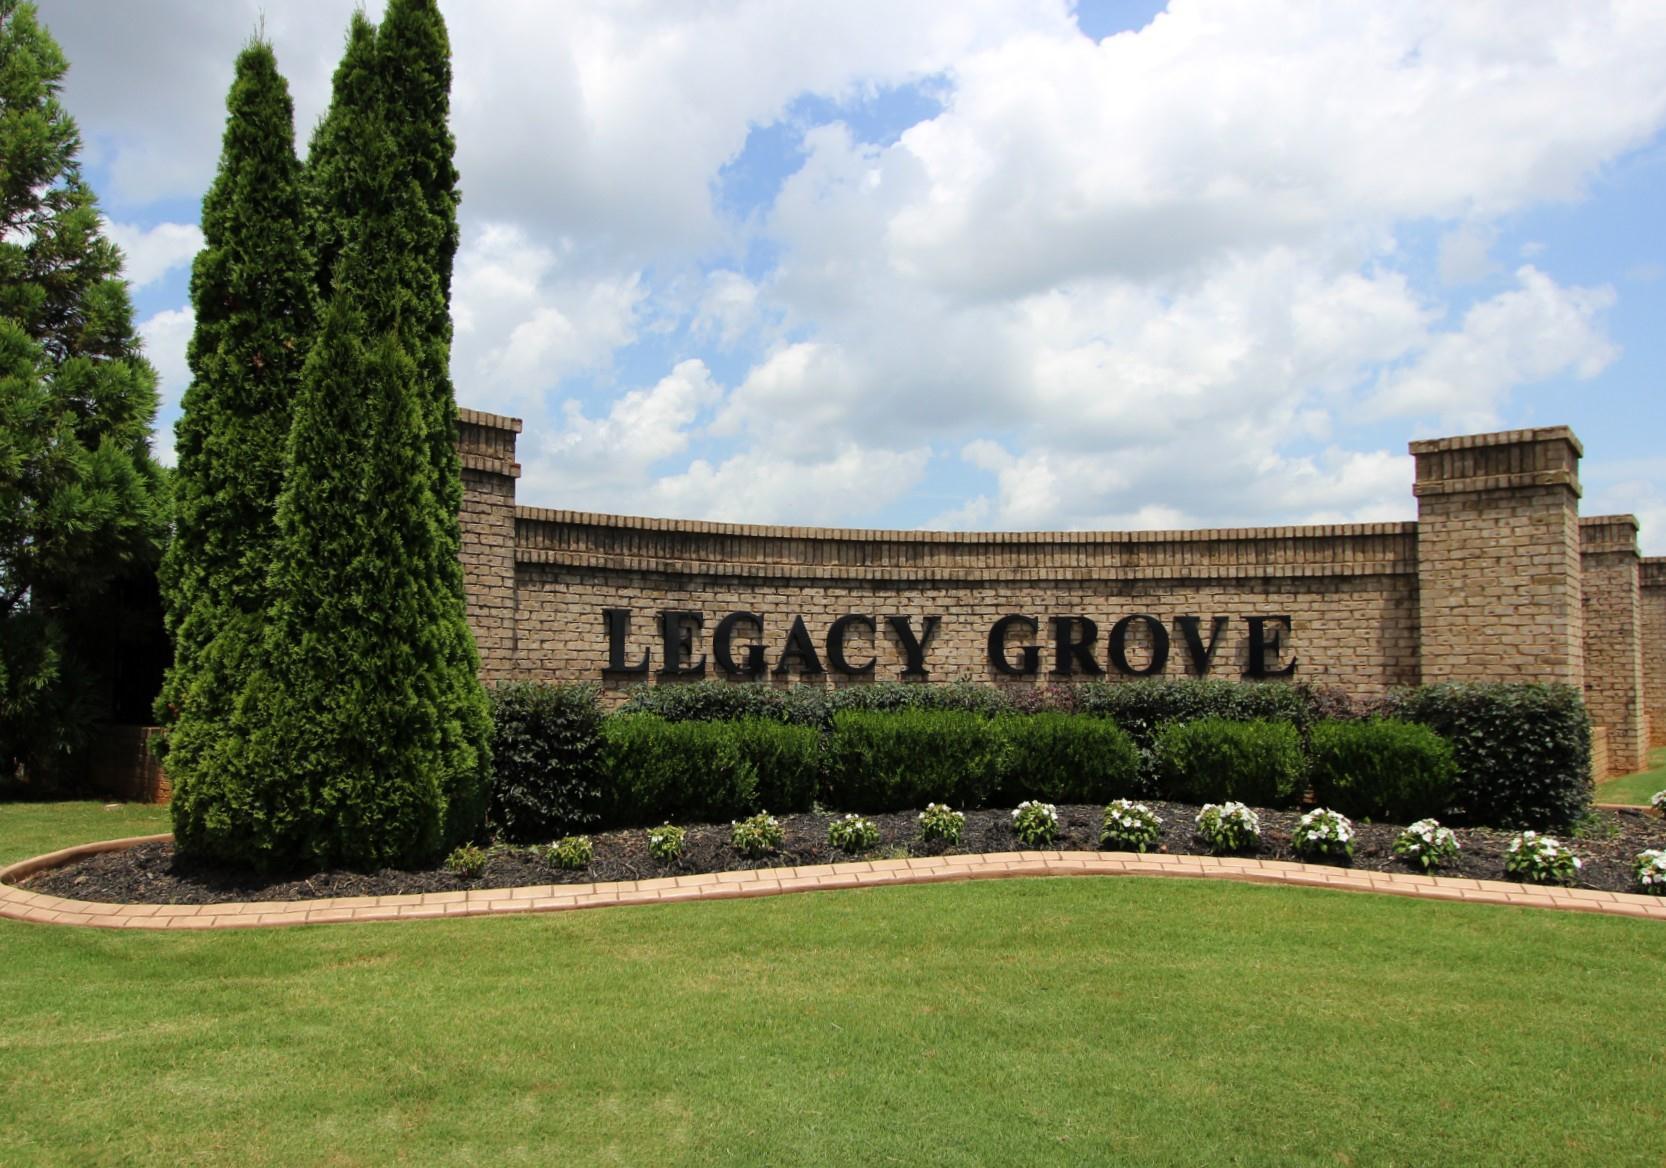 Legacy Grove Entrance